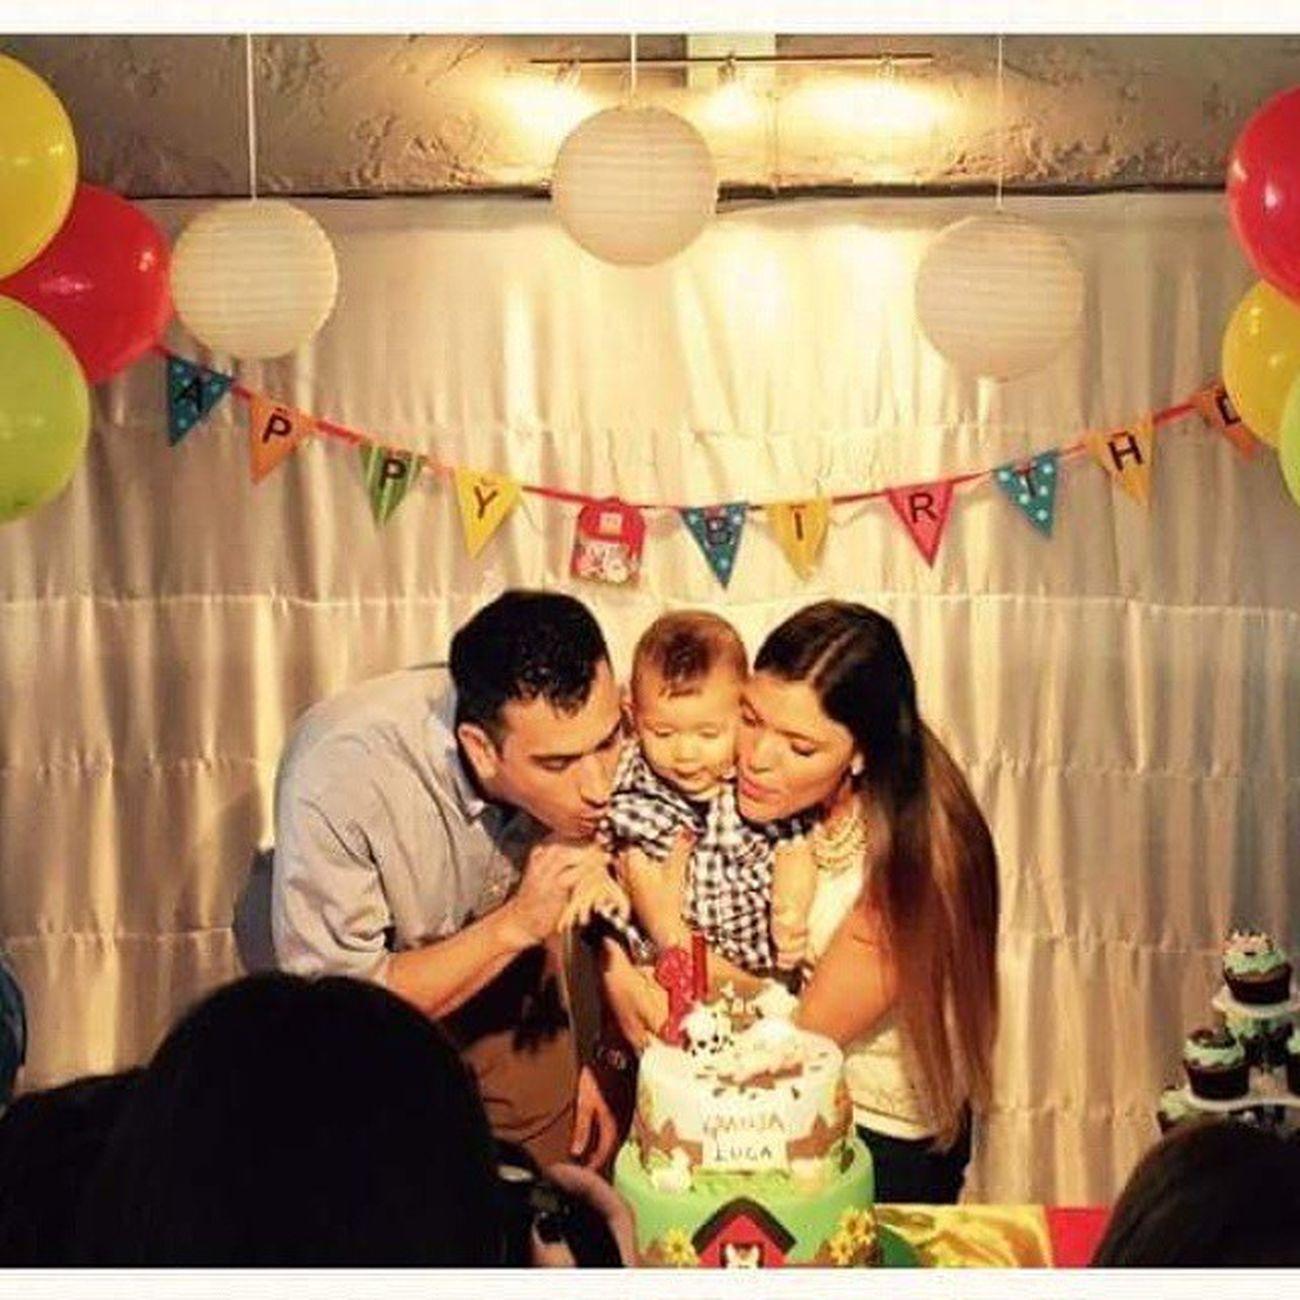 Luca Sobrino Primer Anito Uruguay Gordito Lindo  Mimoso Tió Feliz Happy Nice Cute Papas Tin Natu TQM Love Cumpleaños Tarta Sopalarvelas 1°